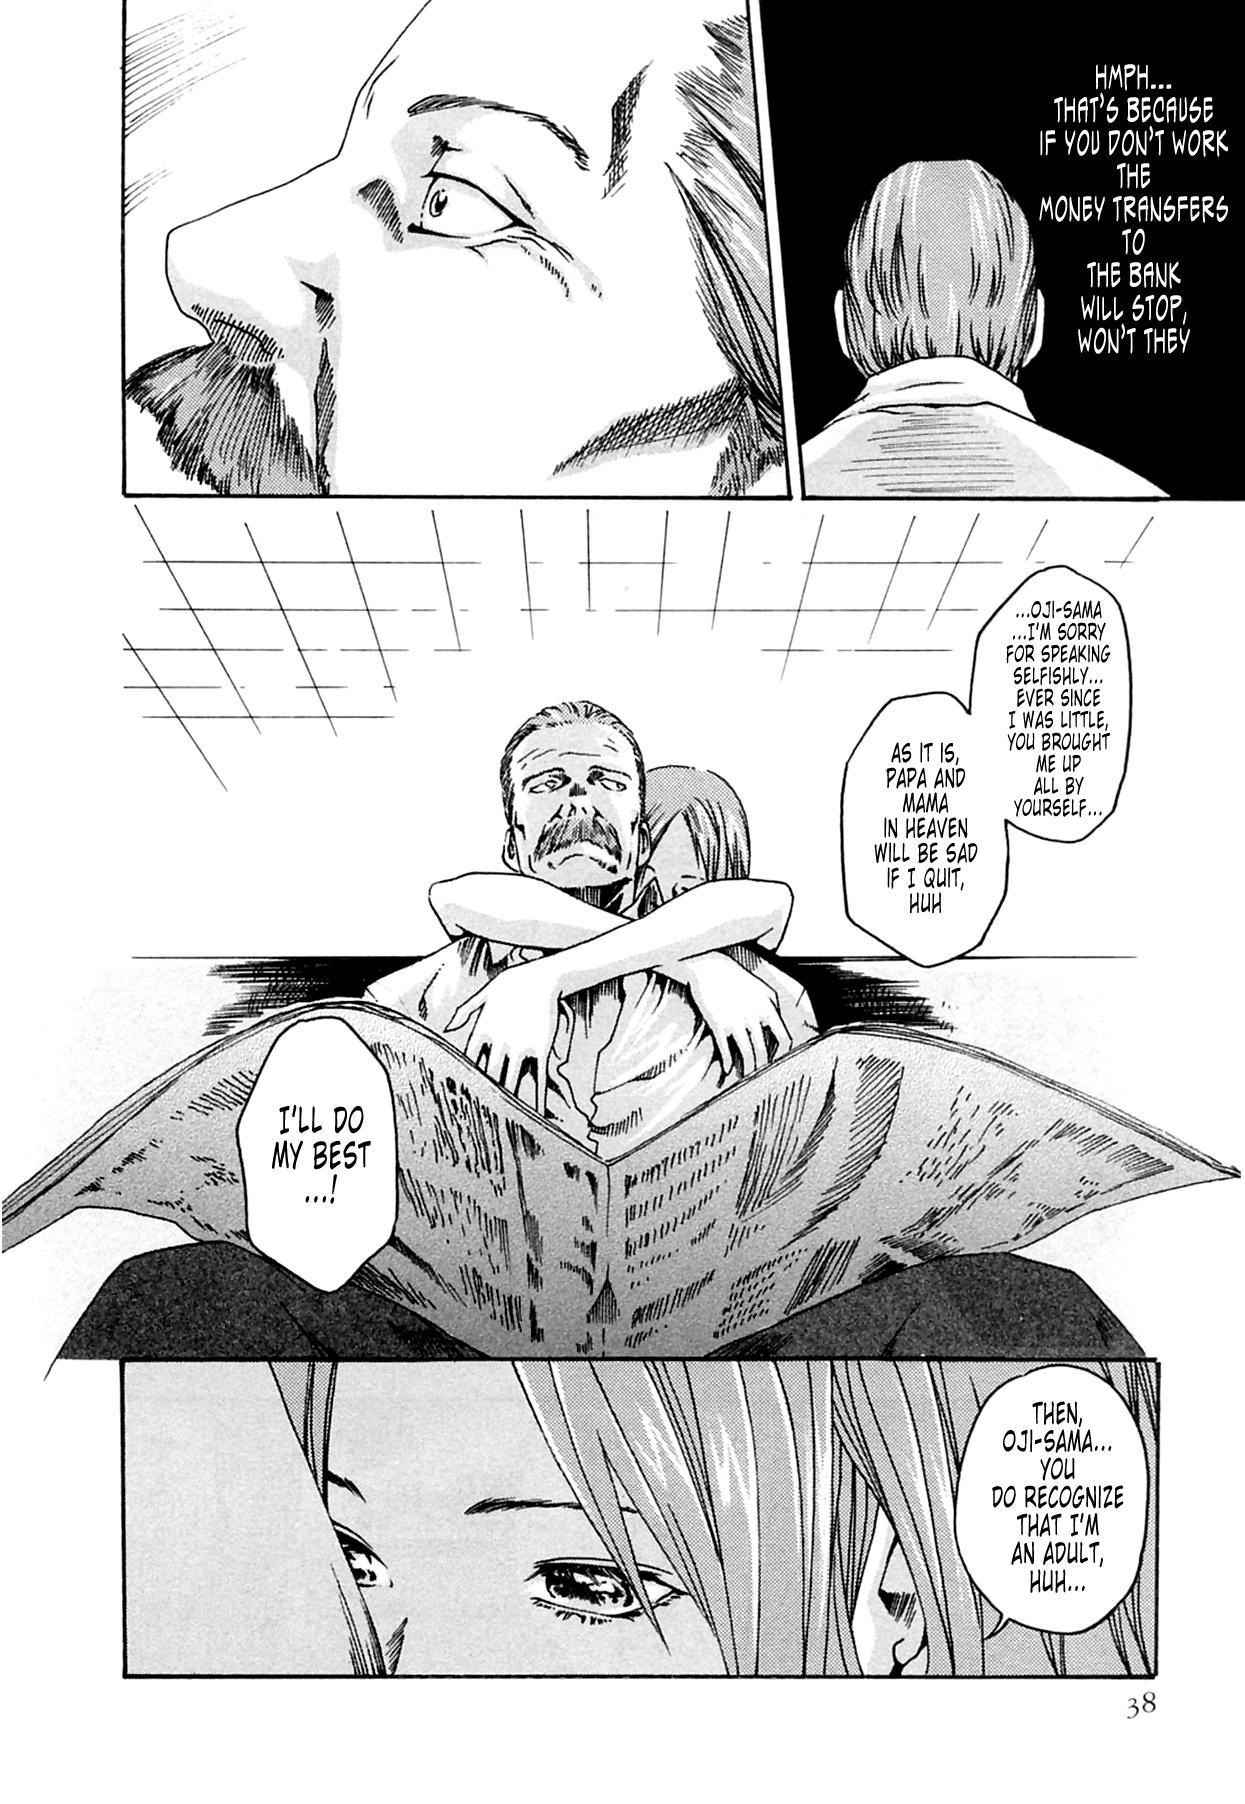 [Haruki] Kisei Juui Suzune (Parasite Doctor Suzune) Vol.02 - CH10-11 37